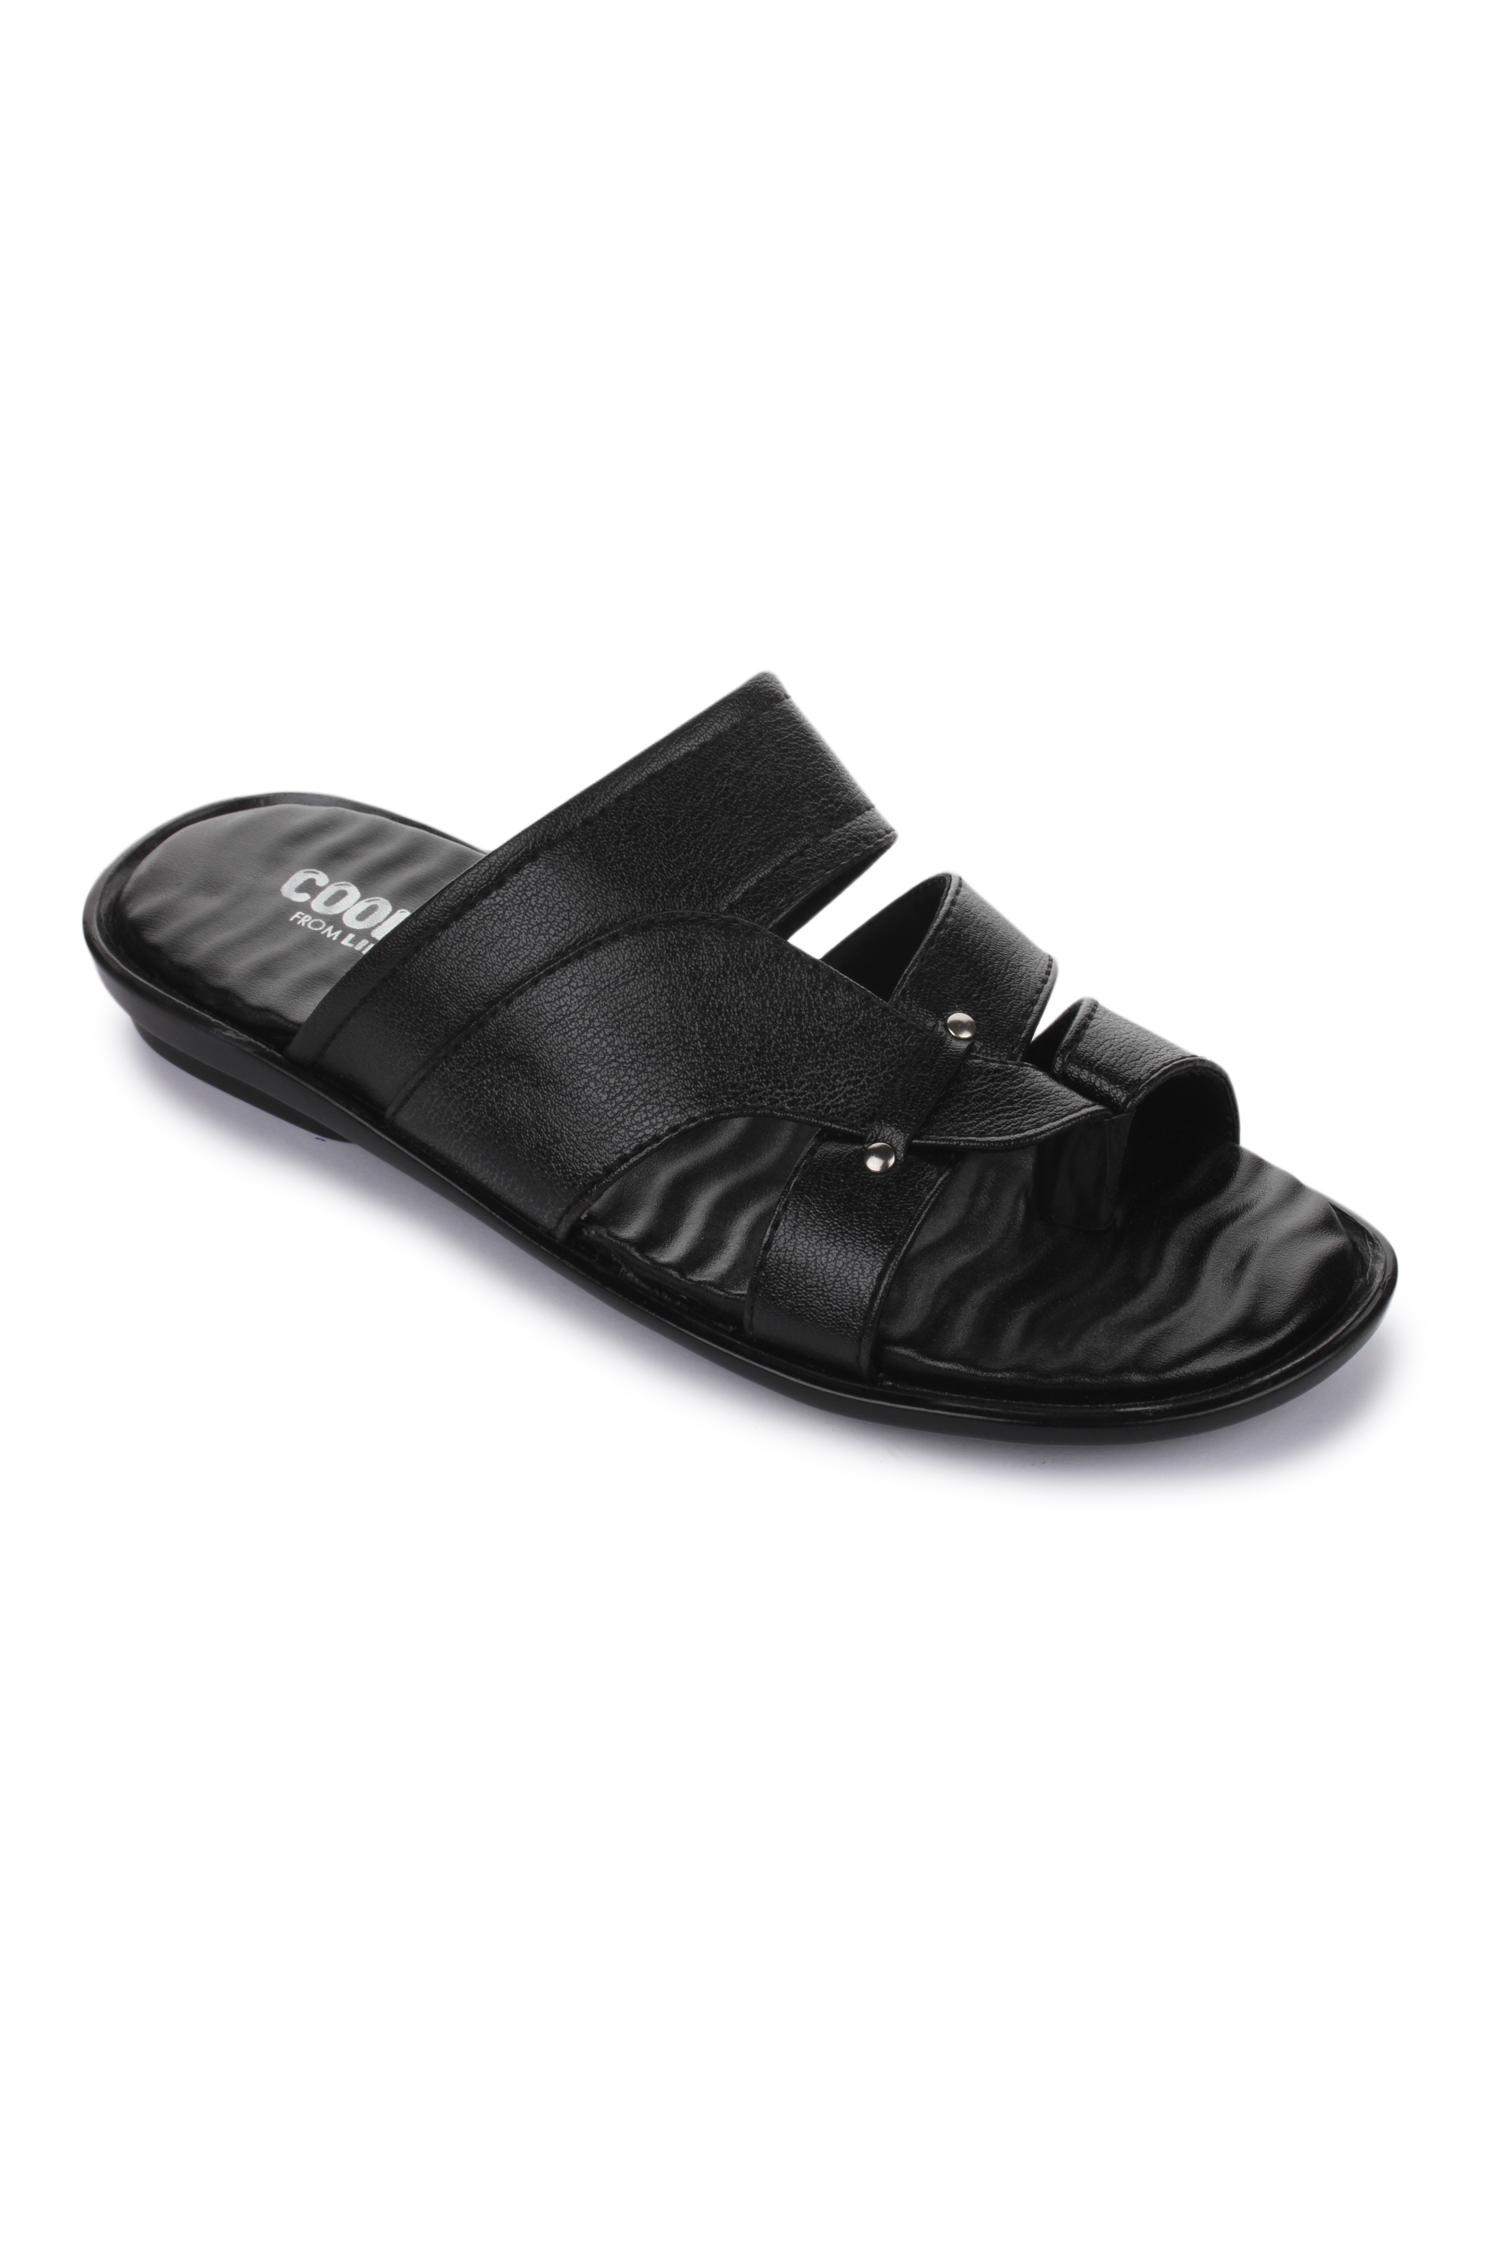 Liberty | Liberty Coolers Black Formal Slippers TRL-113_Black For - Men